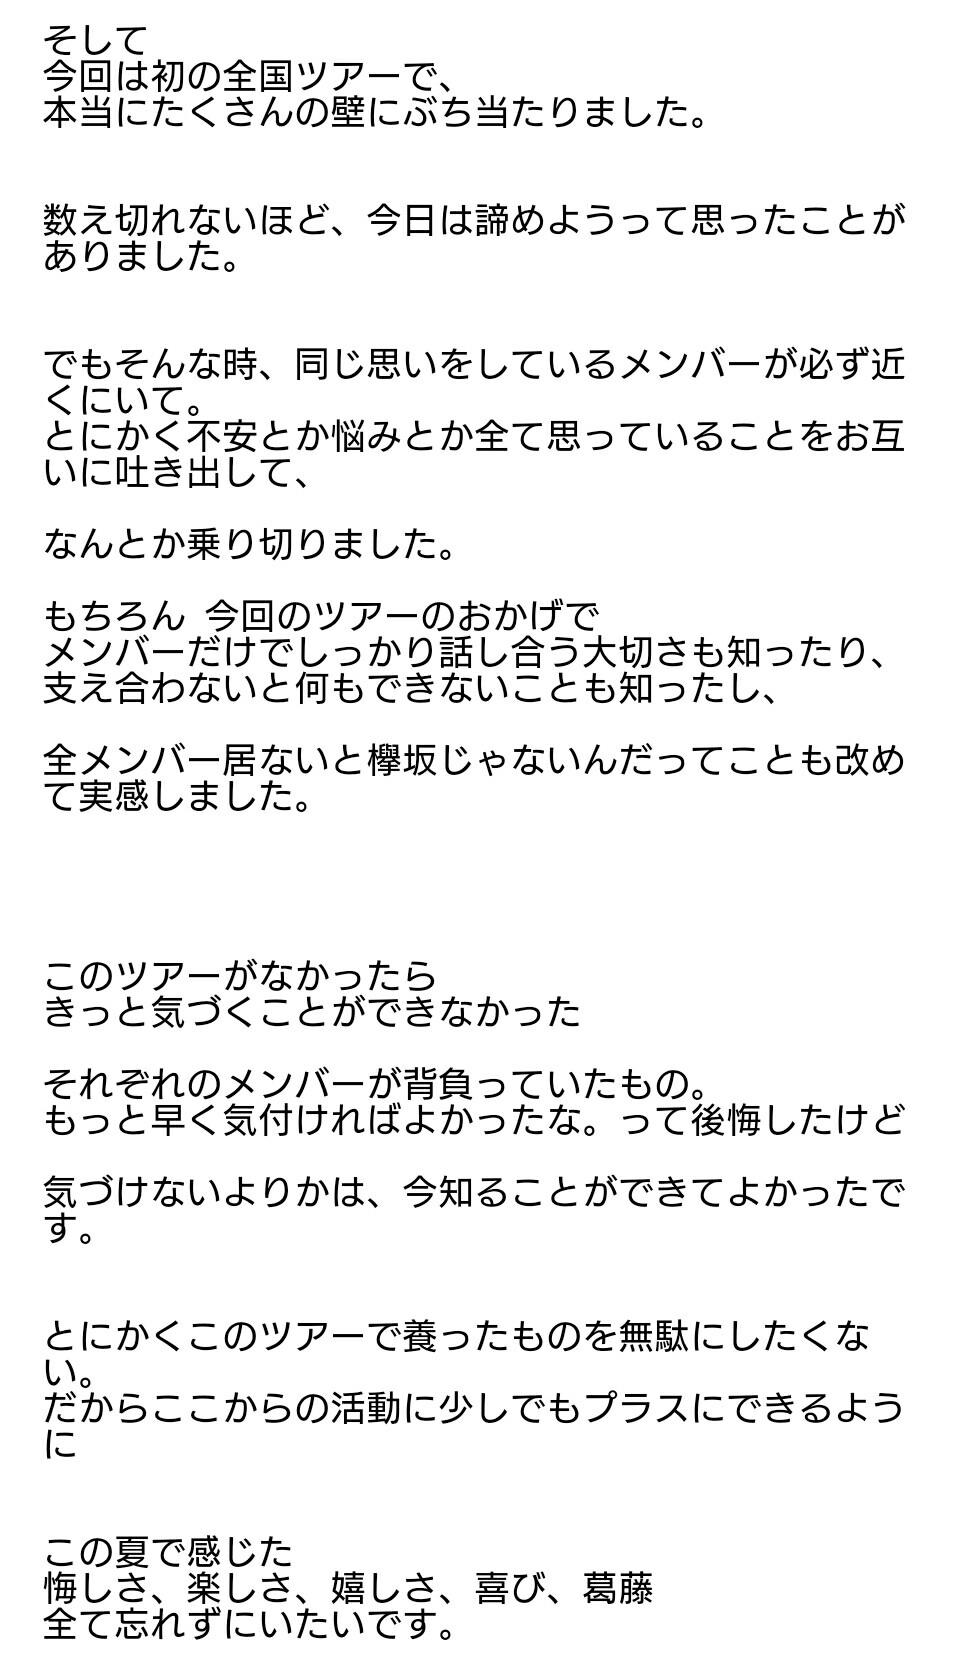 f:id:asitaha46:20170903185041j:image